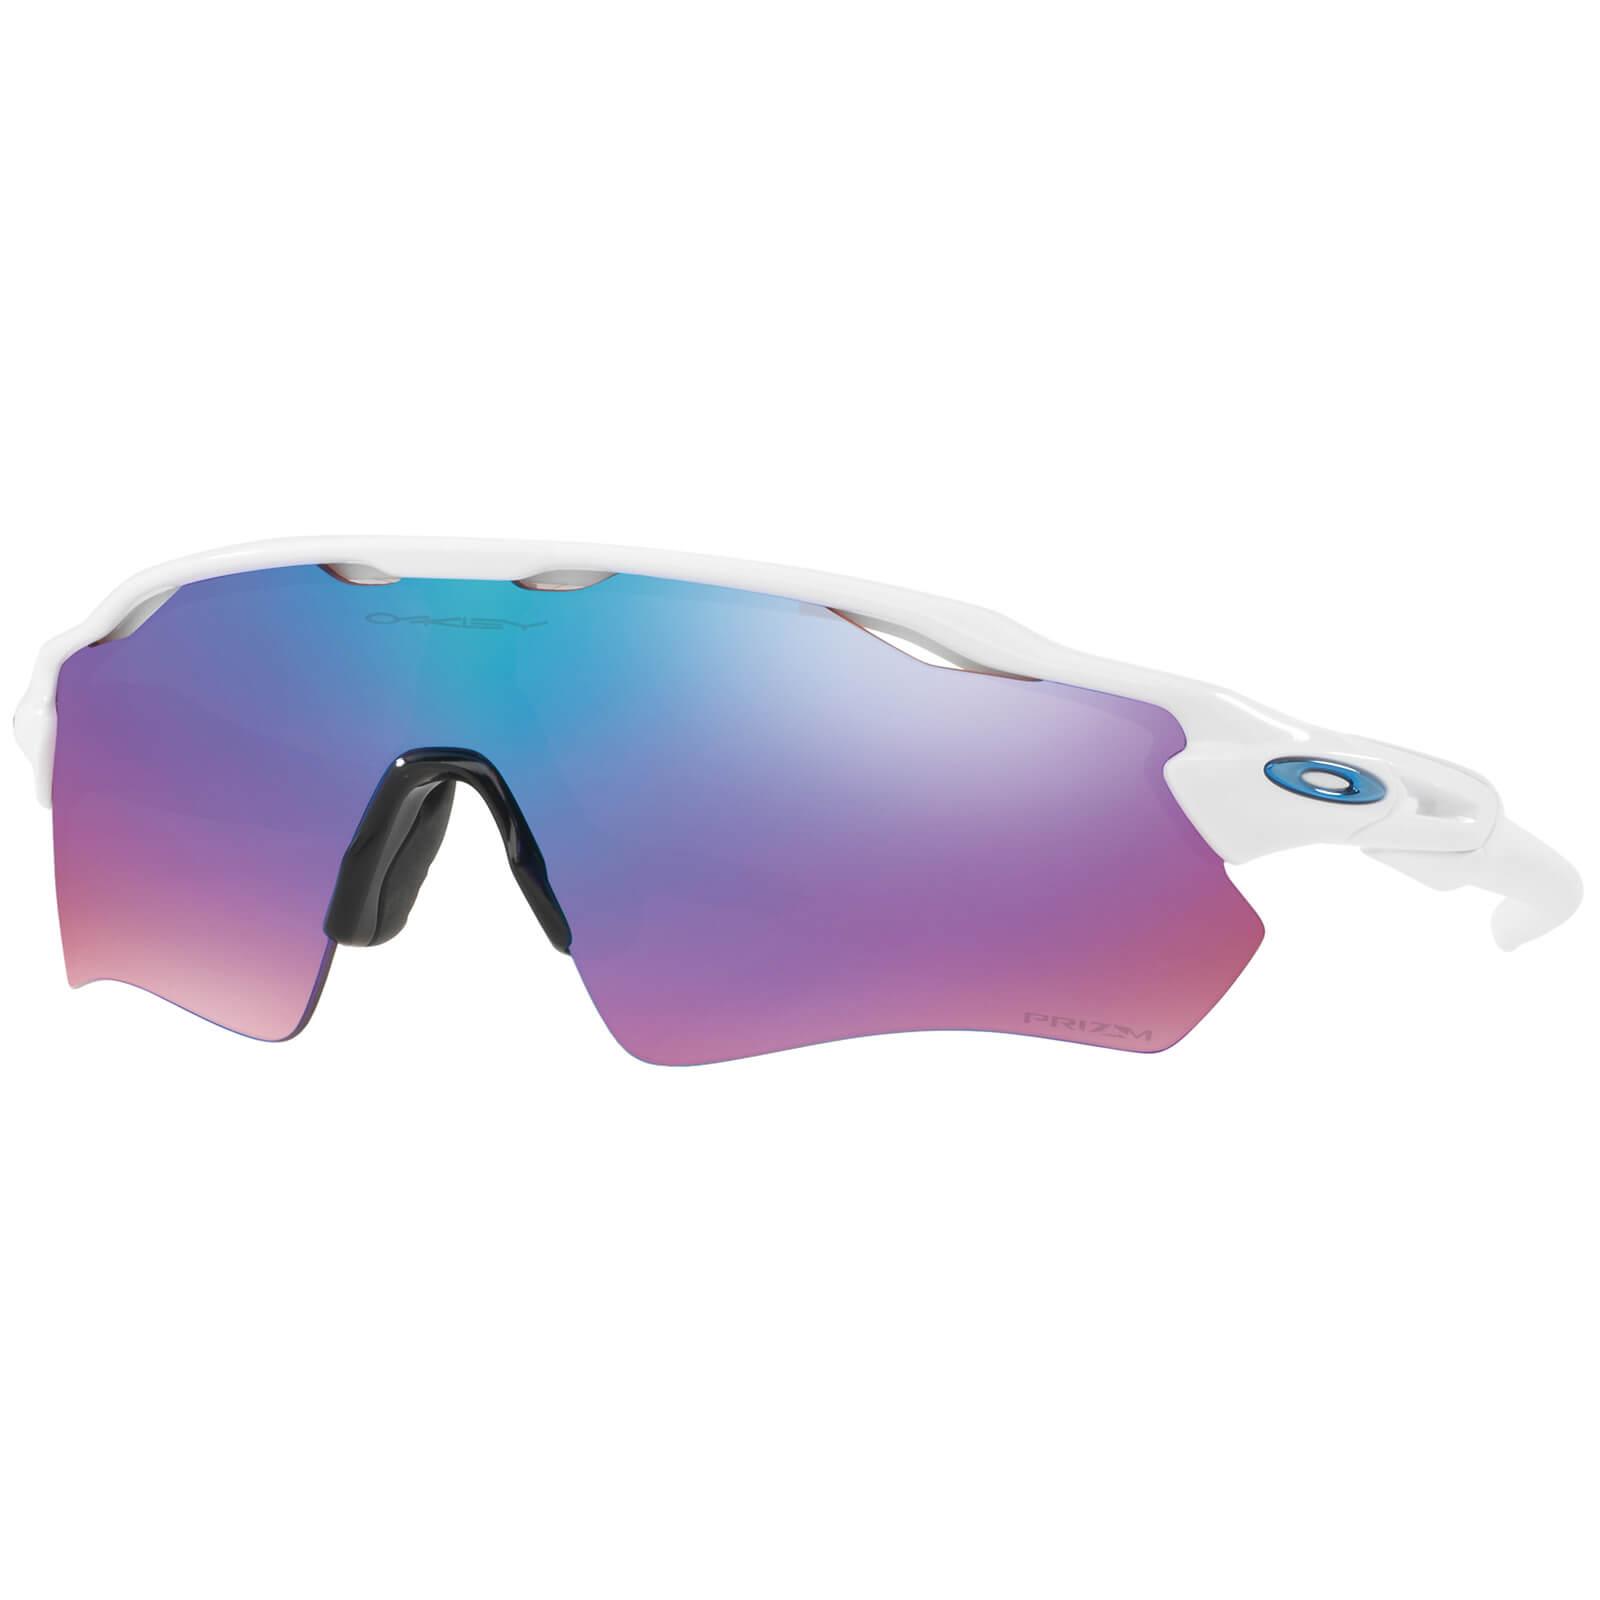 Oakley Radar EV Path Sunglasses - Polished White/Prizm Snow